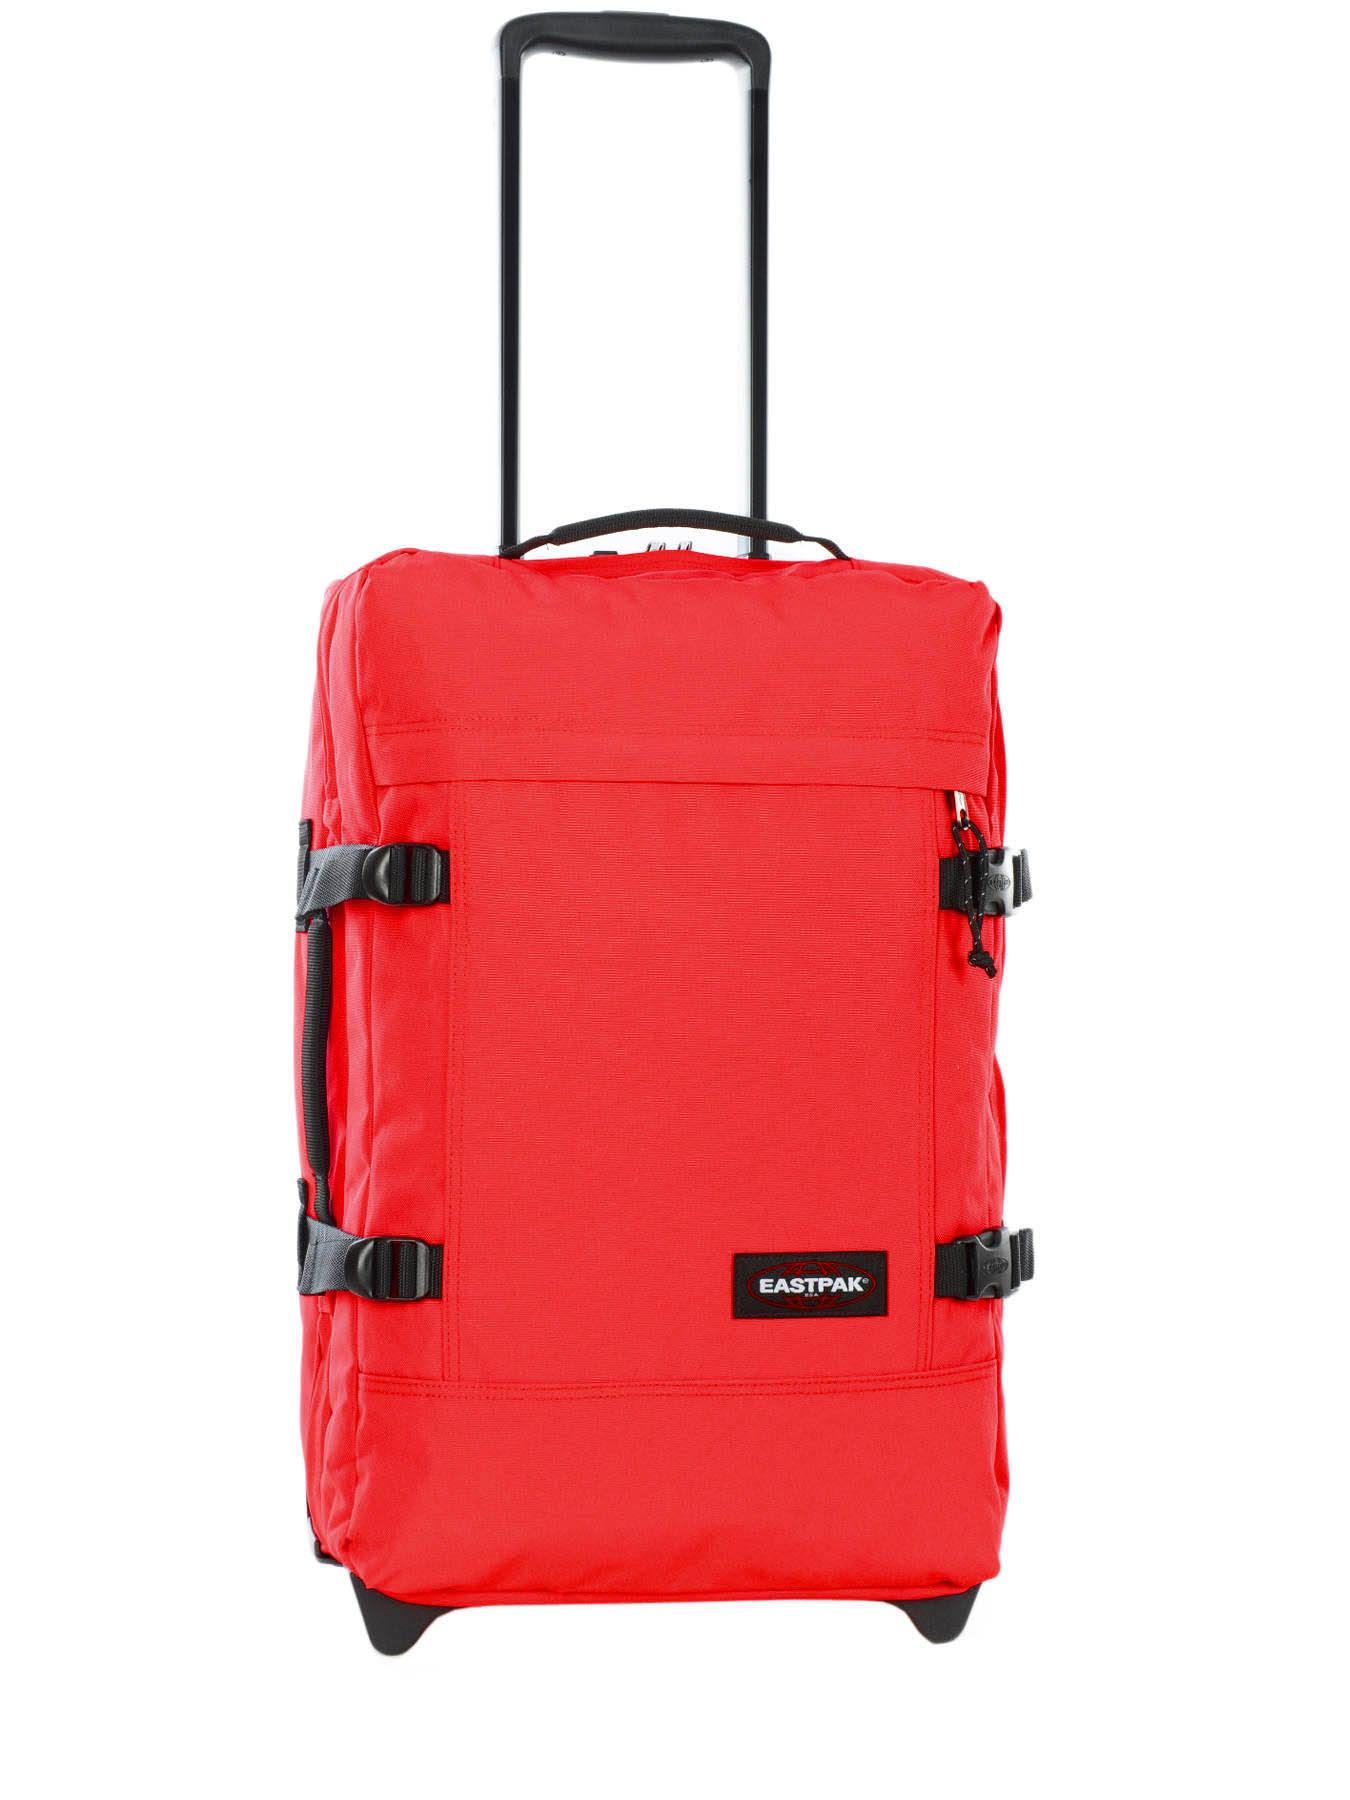 Eastpak Tranverz S trolley suitcase wheeled bag sport bag 33 x 51 x 24 cm